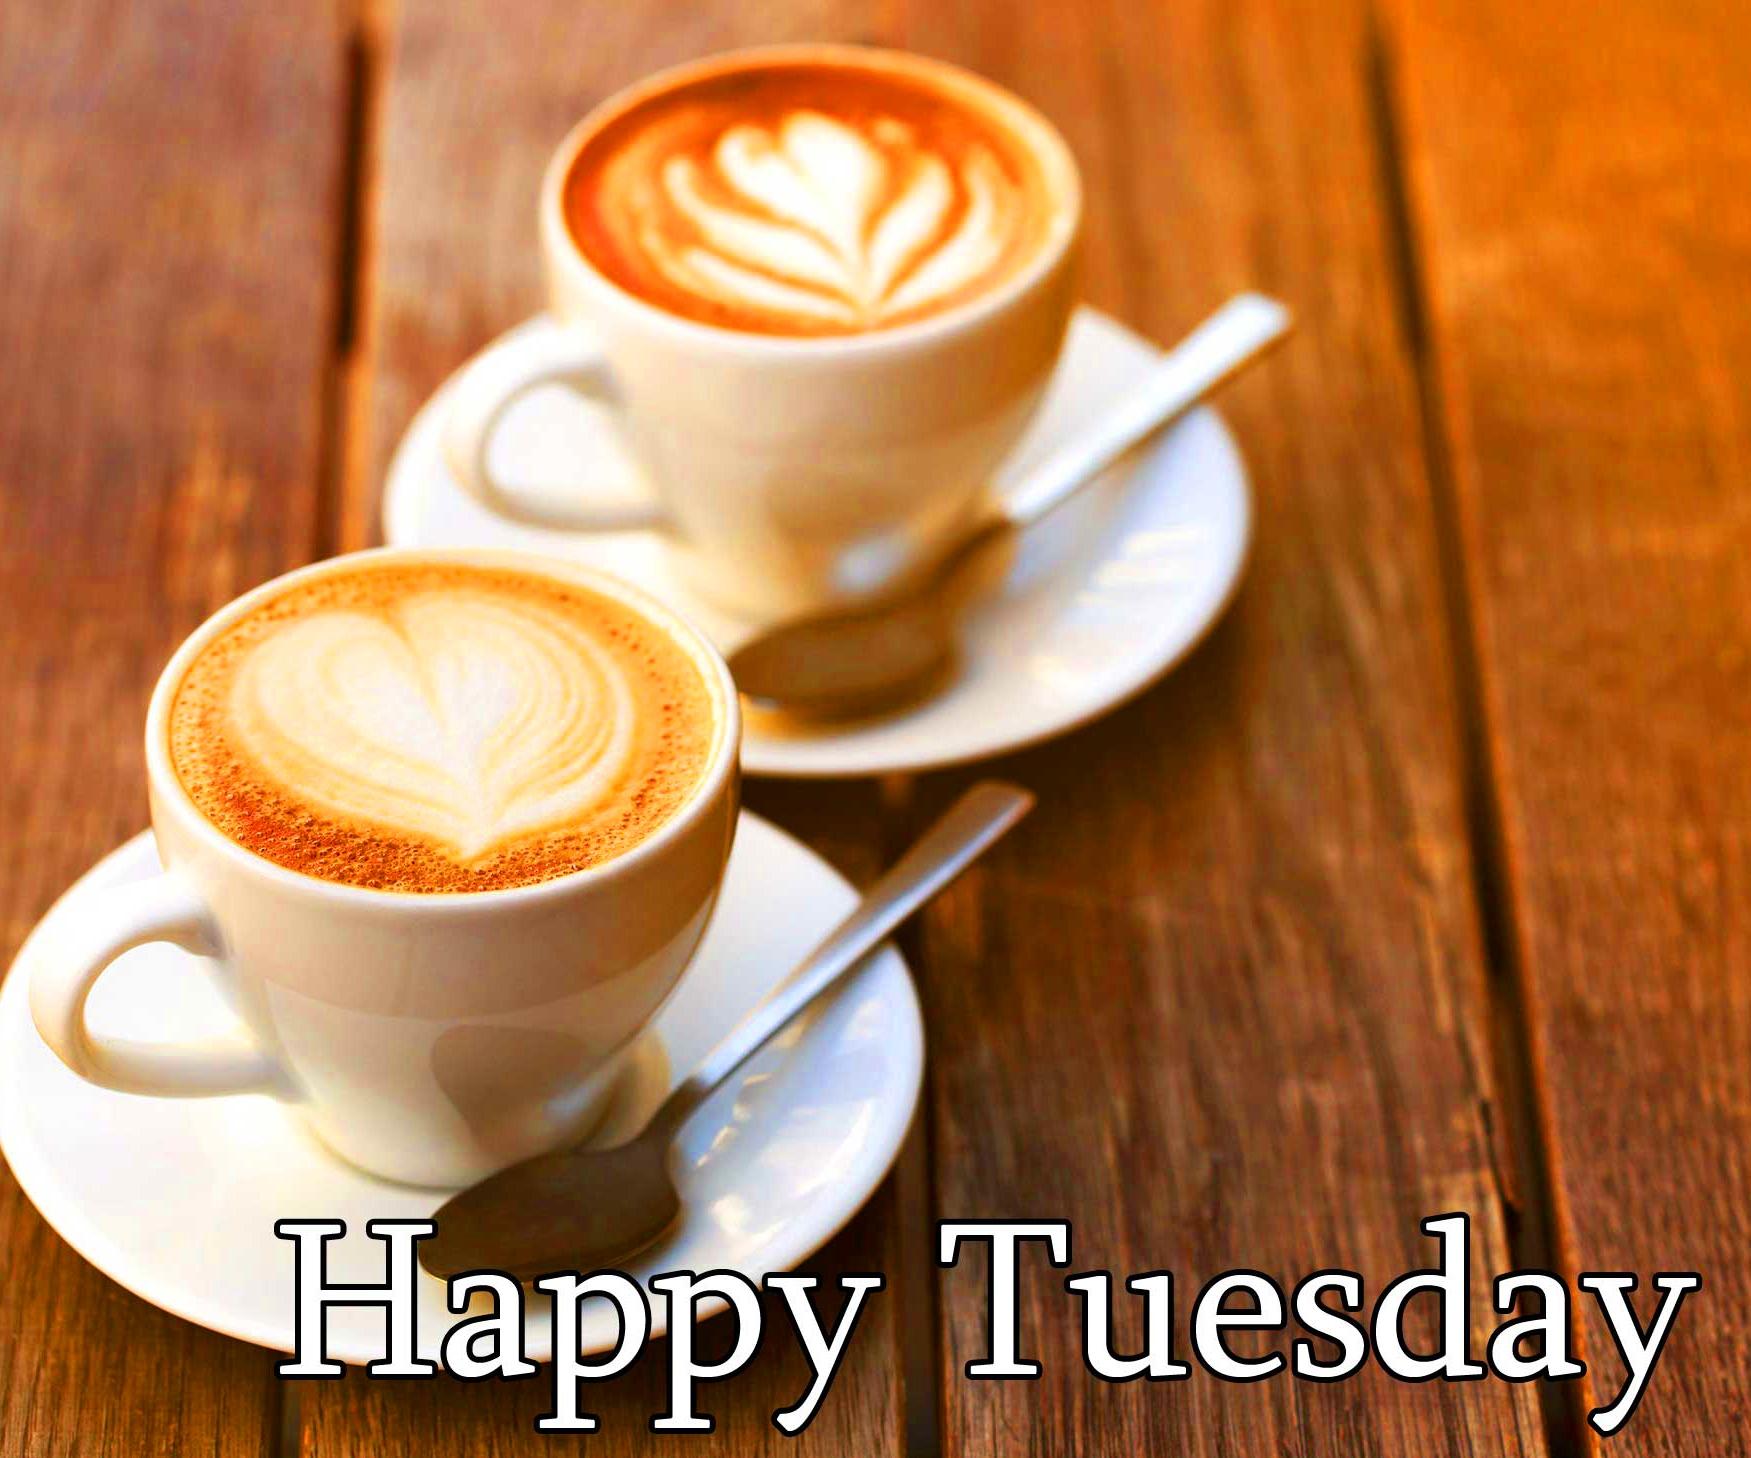 Good Morning Tuesday Hauman JI Images pics Free for facebook